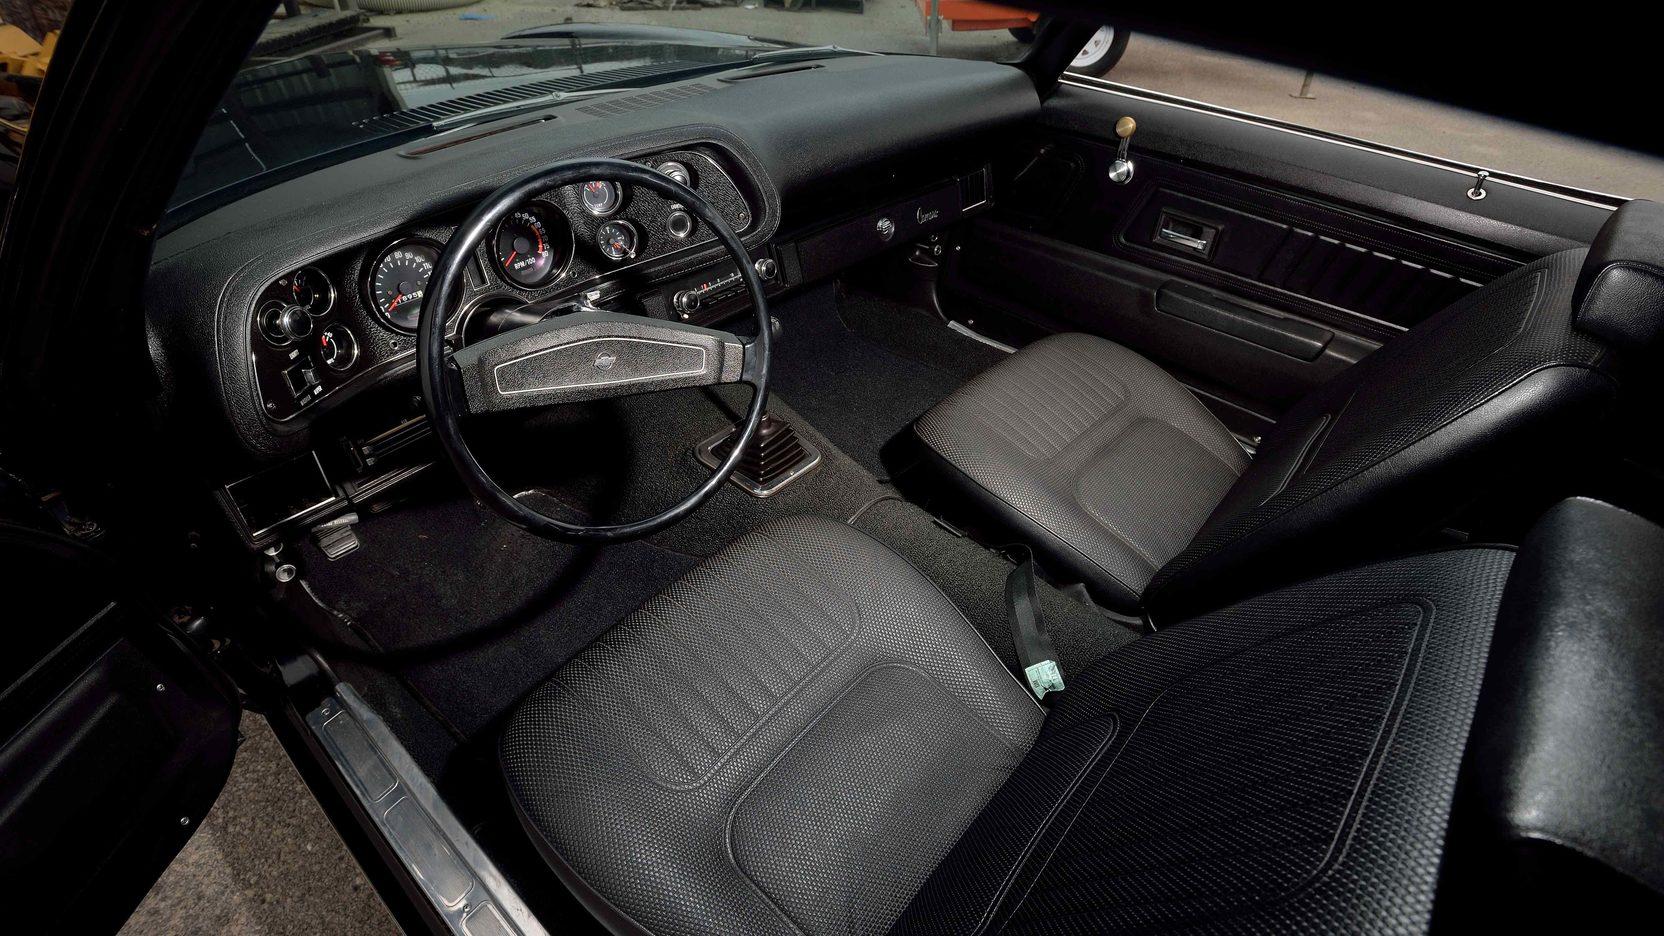 1970 Chevrolet Camaro Z28 interior